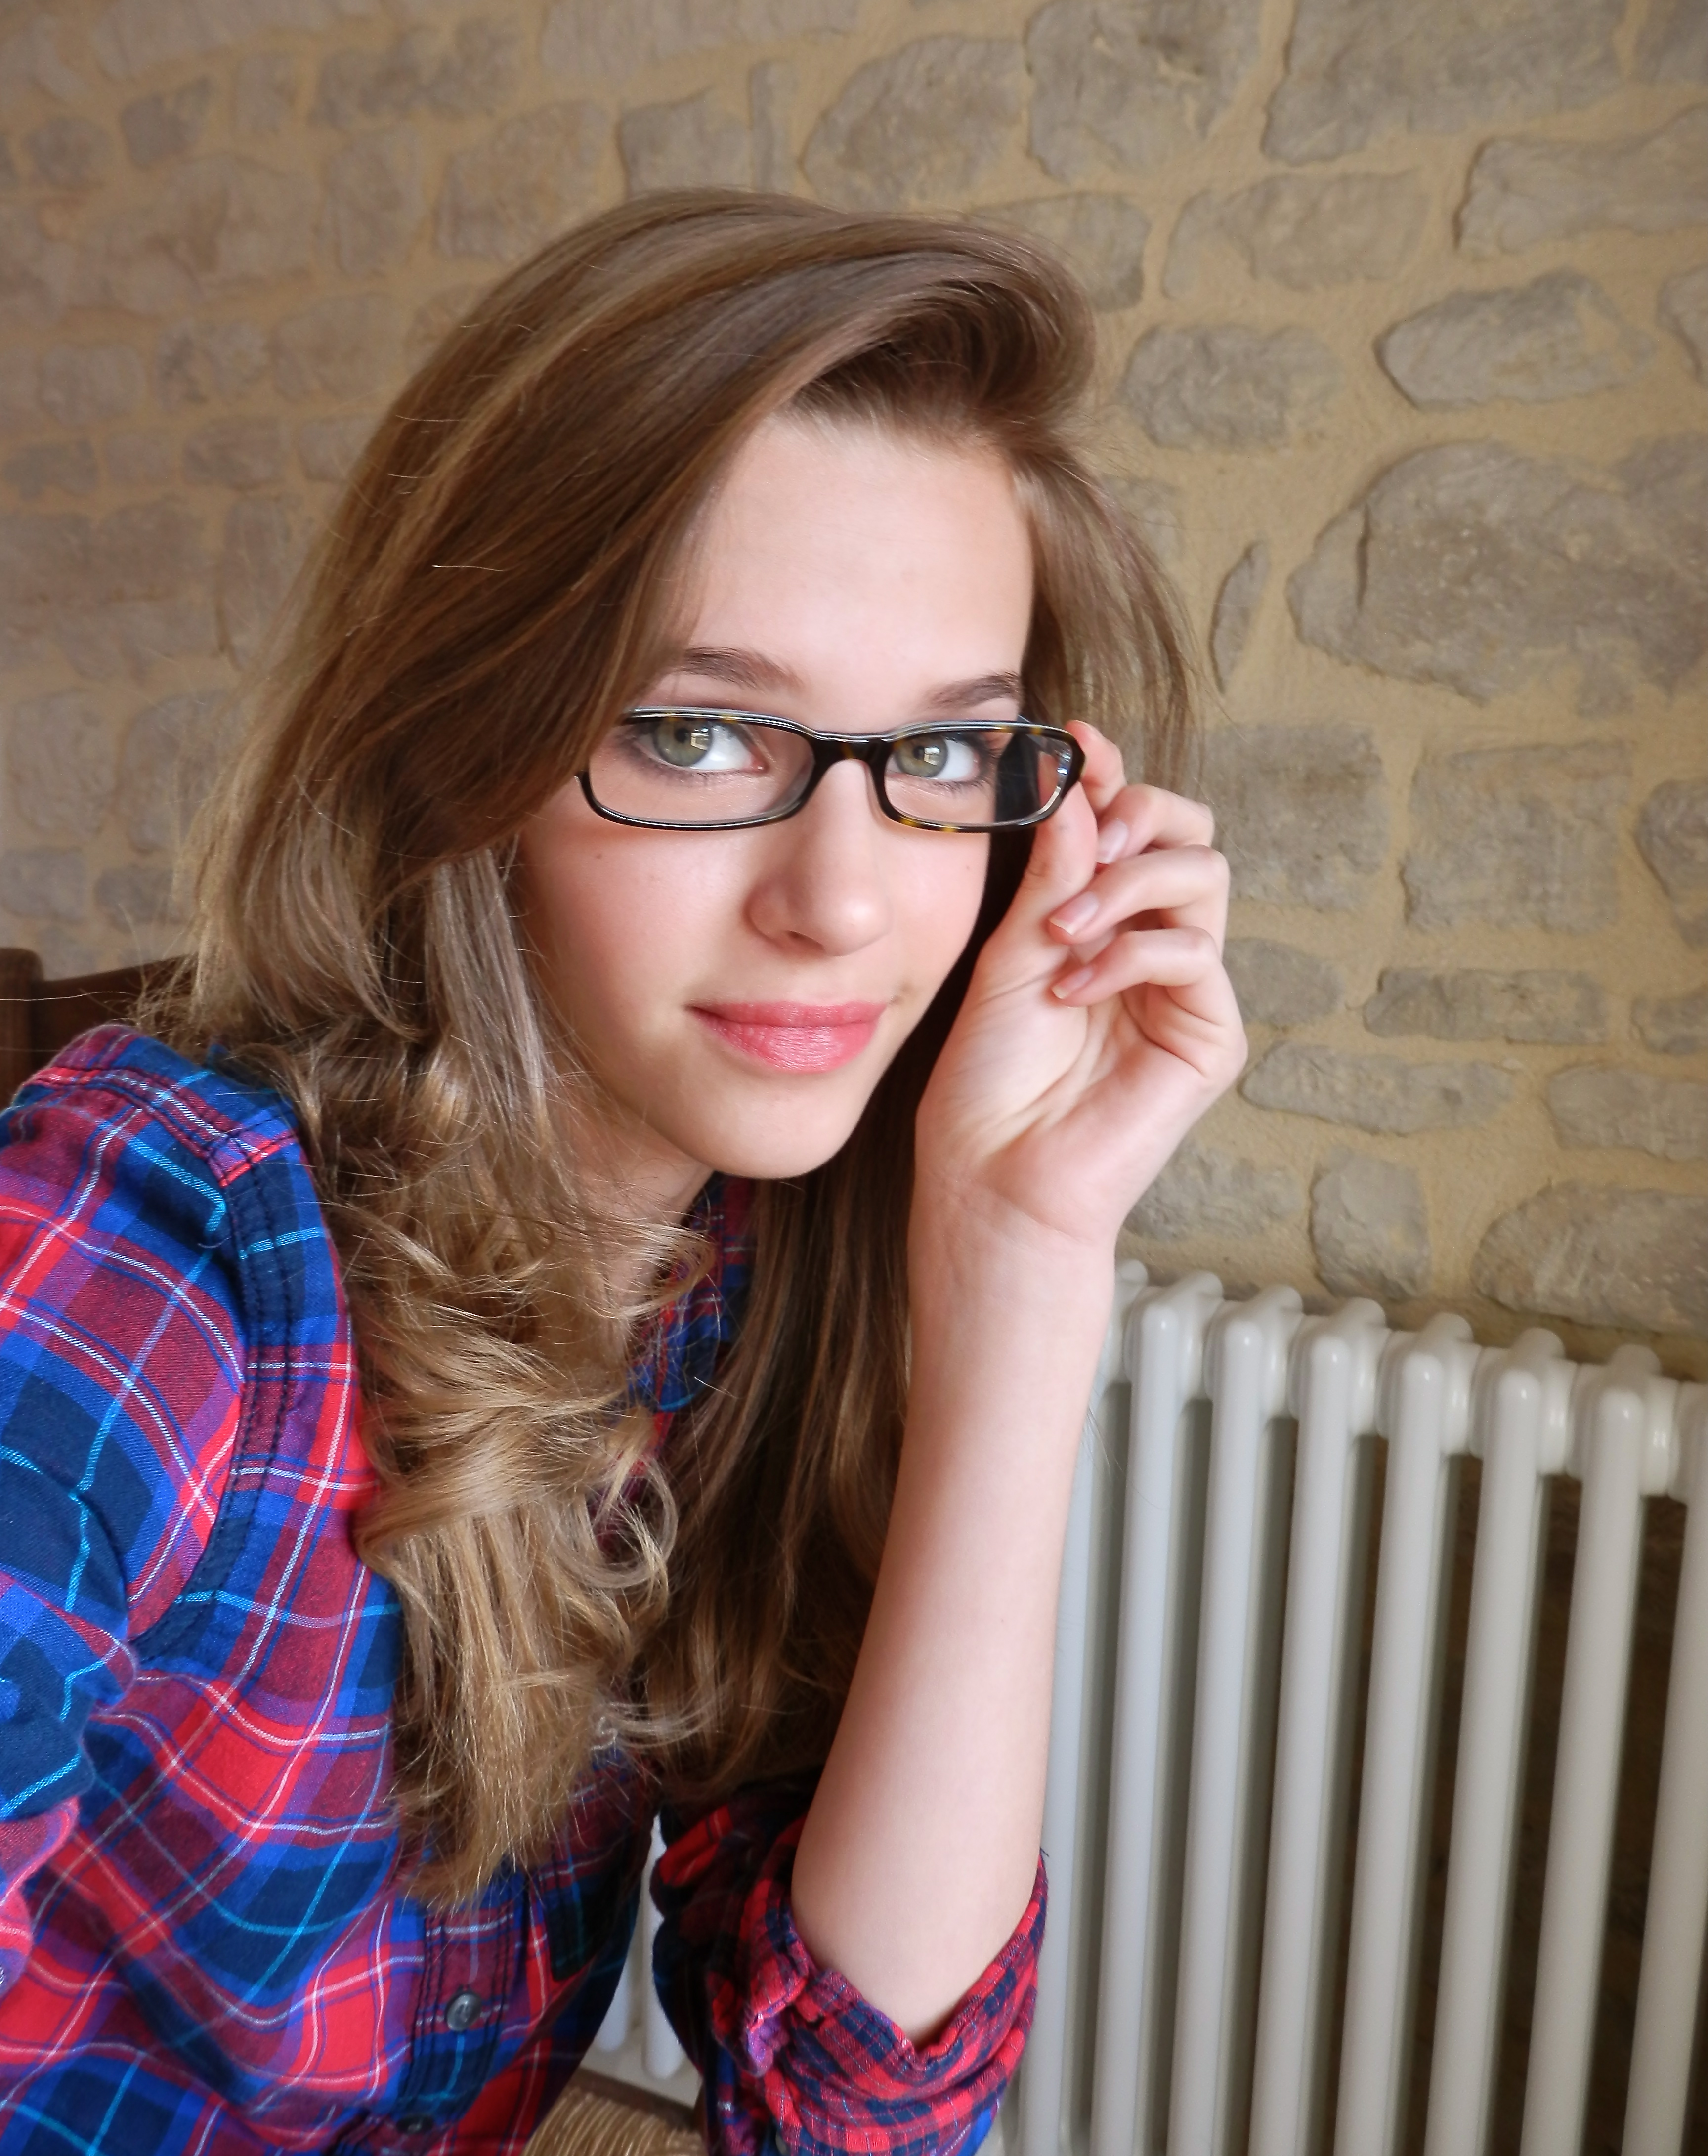 Teen Beauty 21